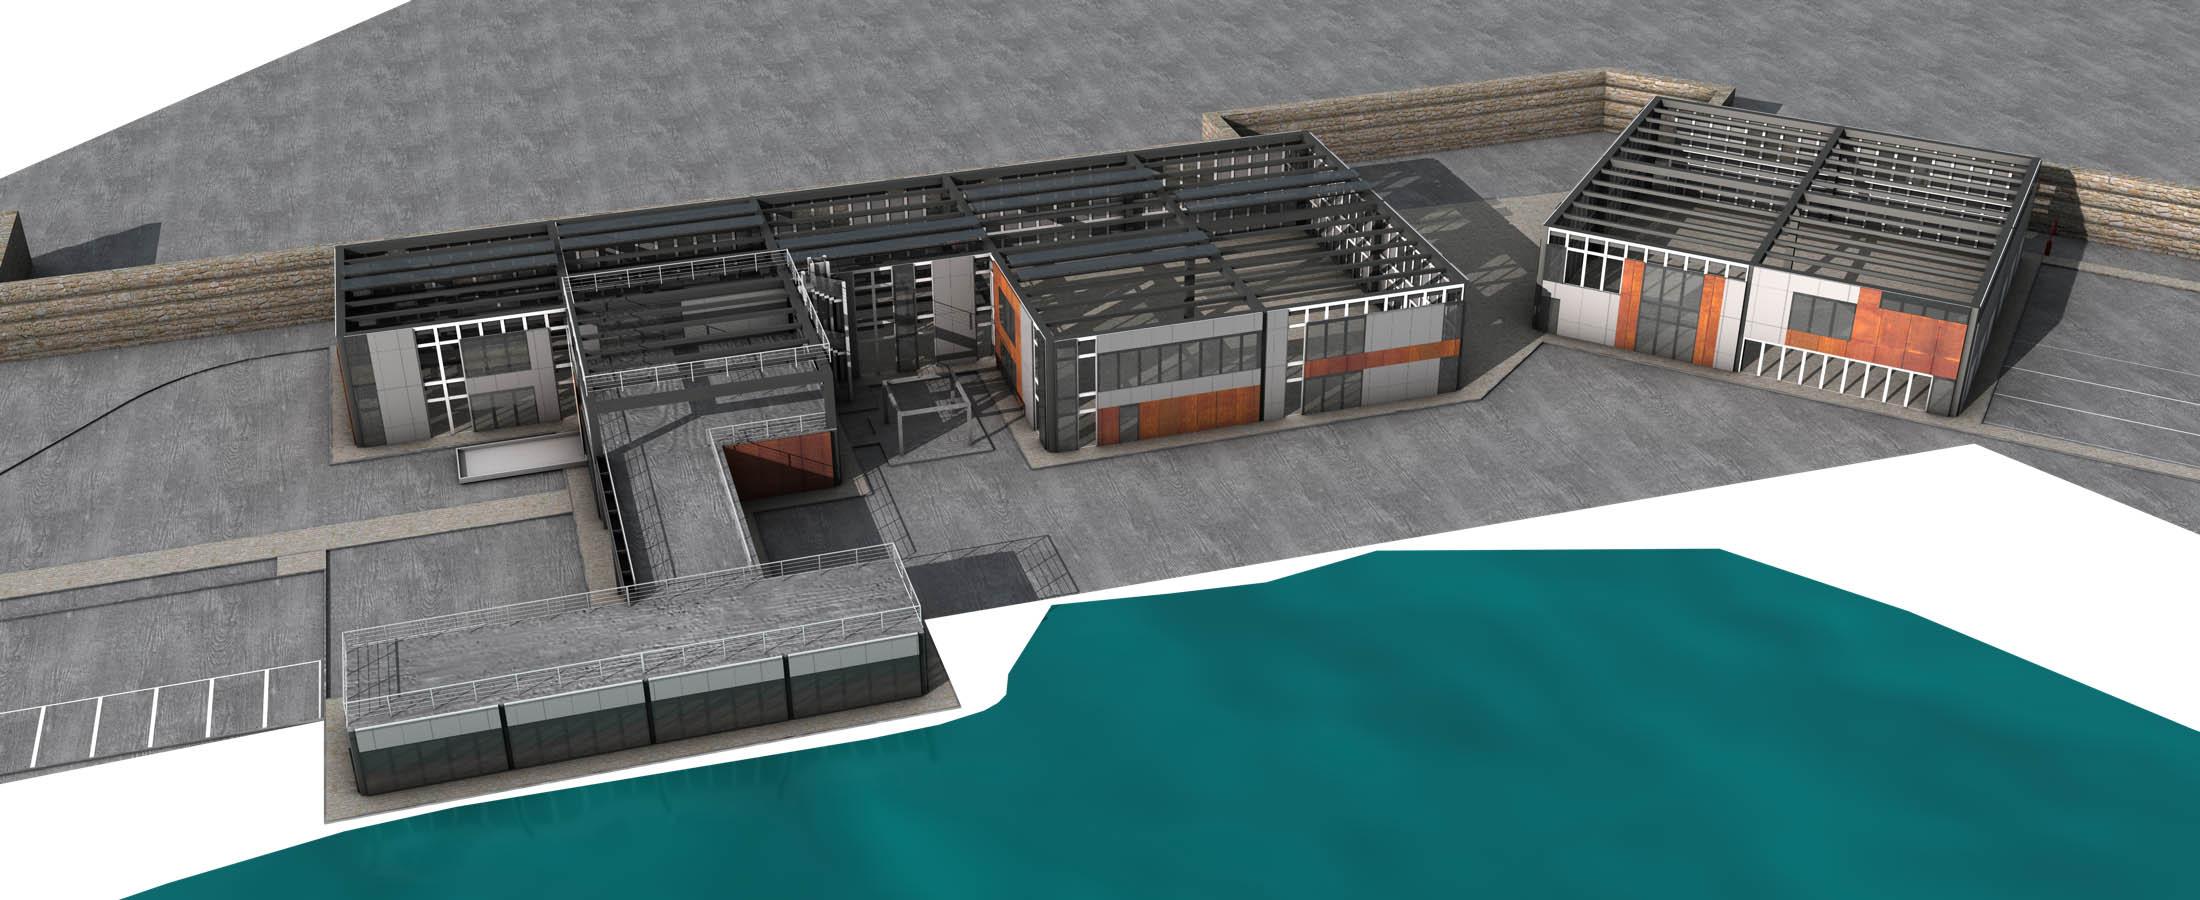 aironic_architettura_design_interior_ewater_factory_rendering2